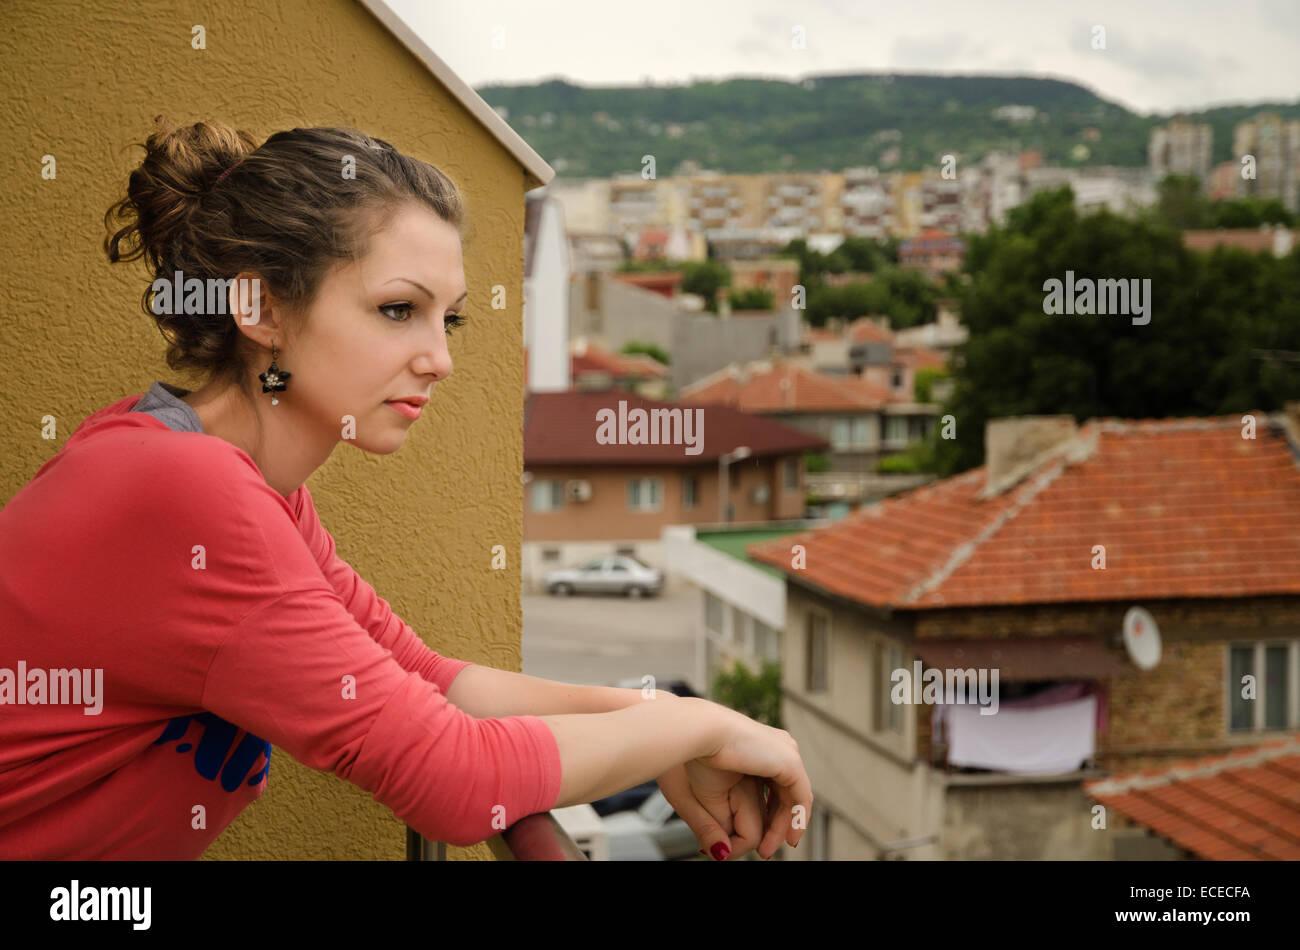 Frau auf einem Balkon stehend Stockbild